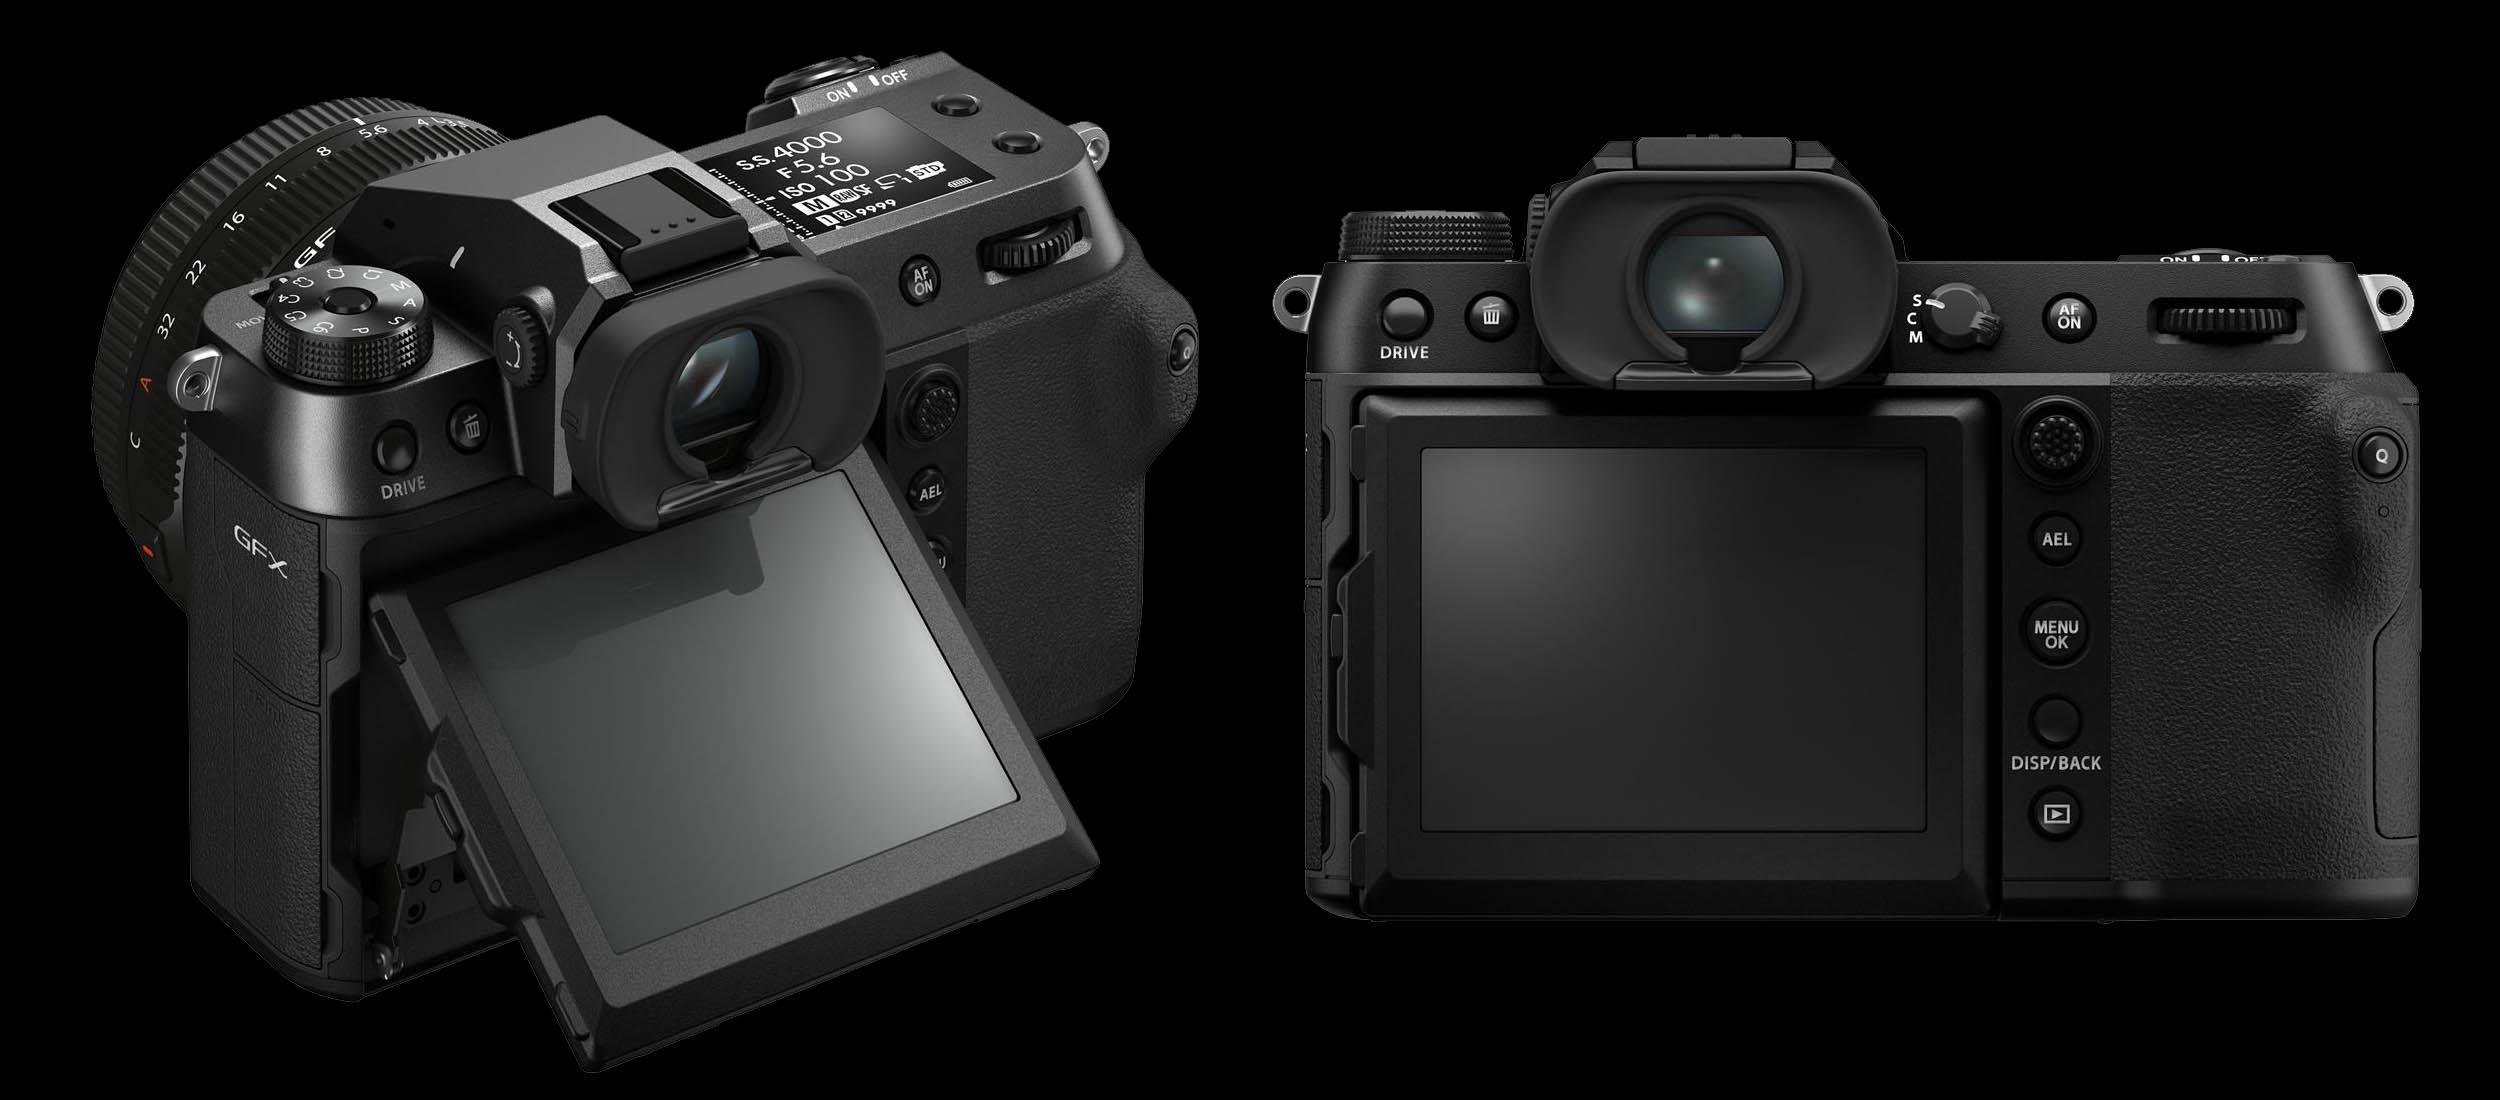 Back Views of the New Fujifilm GFX100S 102MP Medium Format Camera